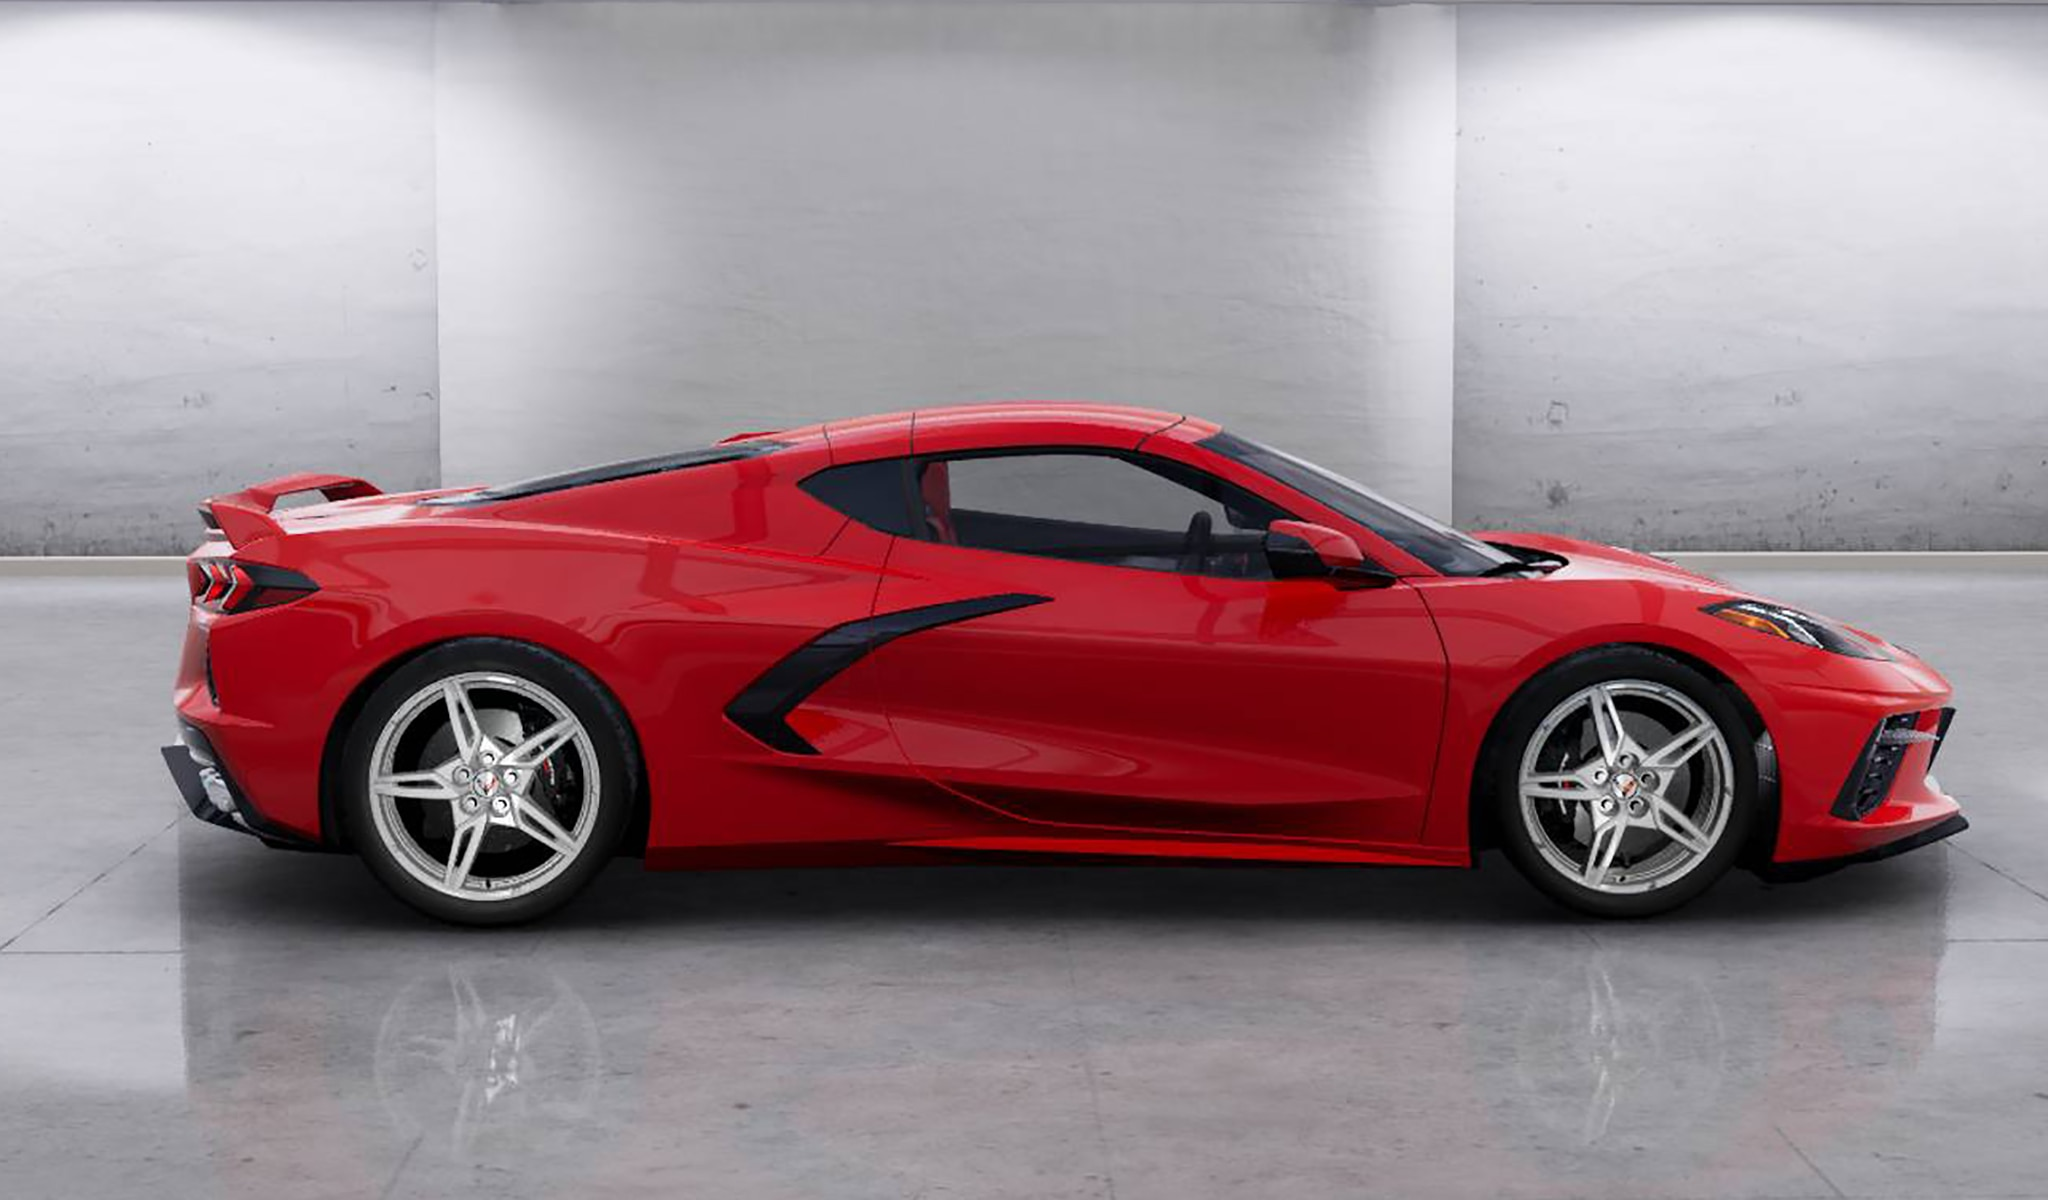 2020 C8 Chevrolet Corvette Stingray All The Colors Carsradars